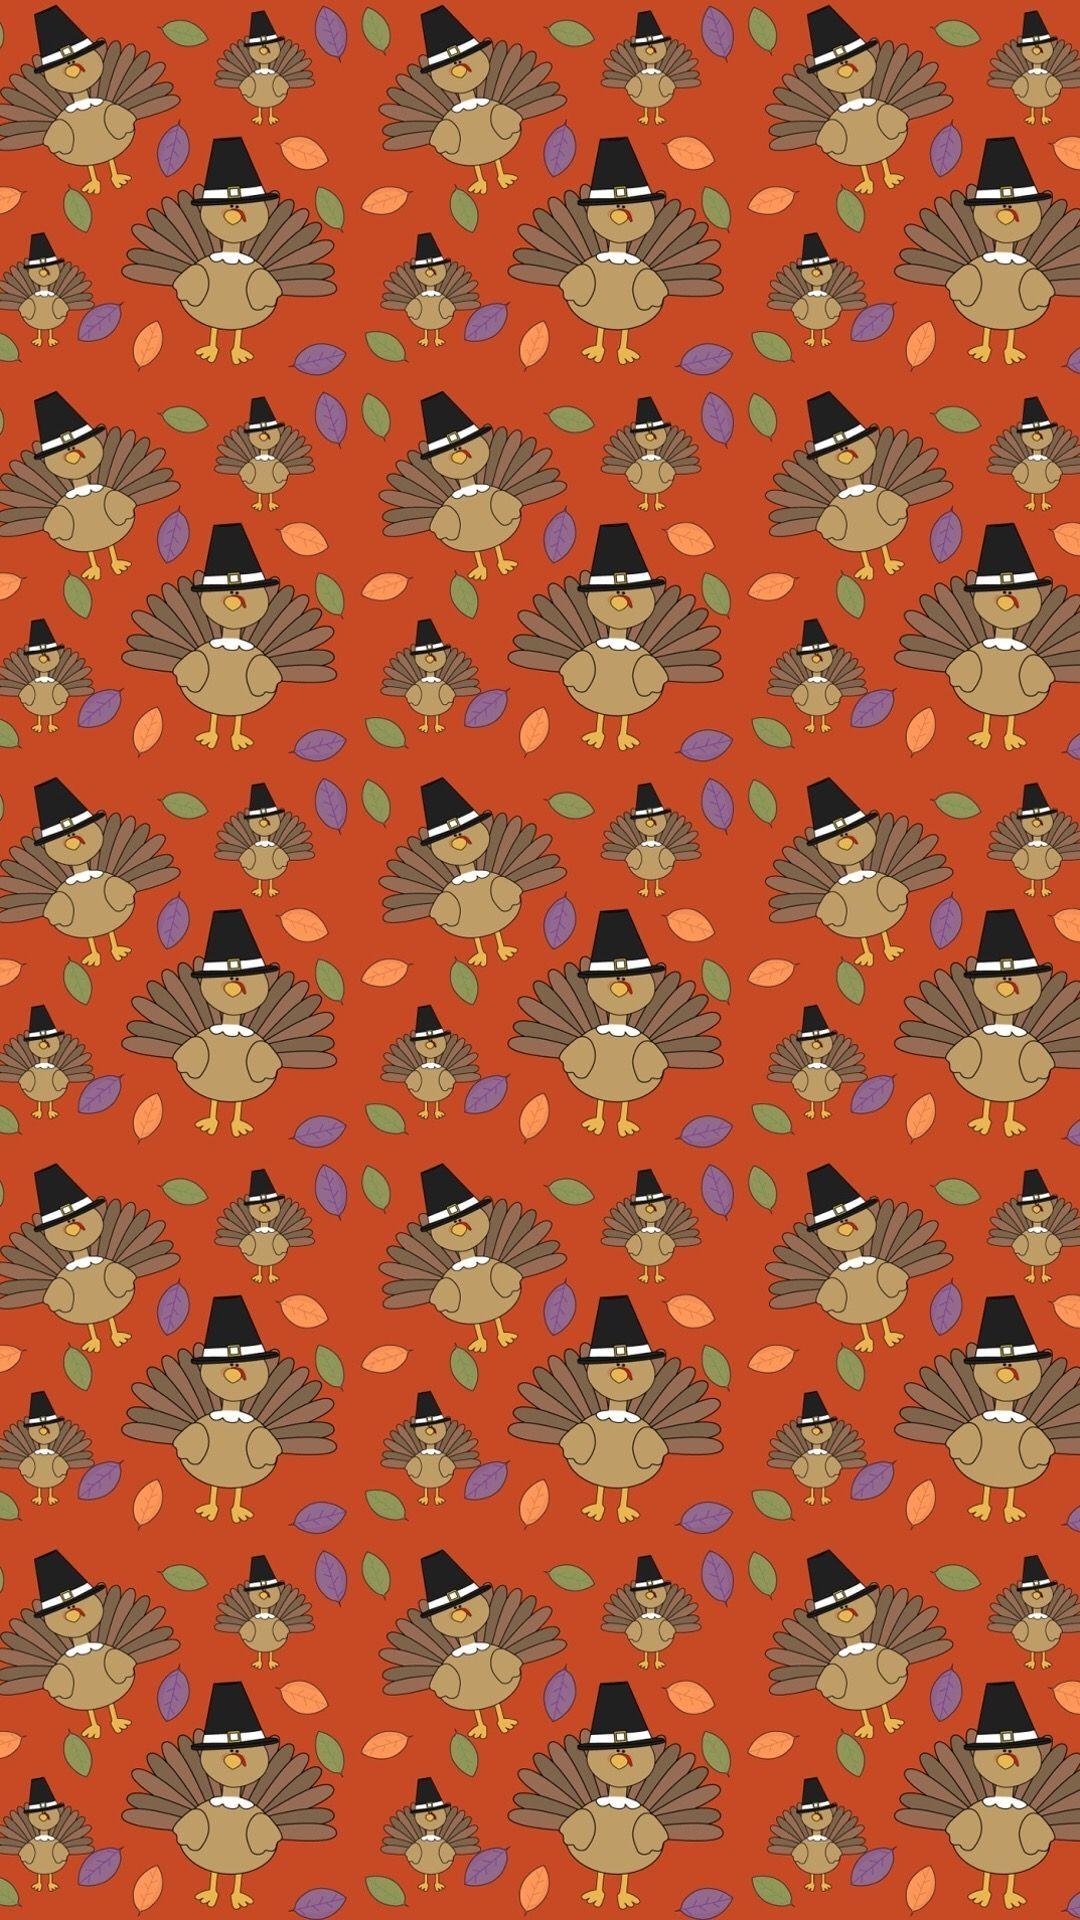 Res: 1080x1920, Fall Wallpaper, Holiday Wallpaper, Wallpaper Backgrounds, Phone Backgrounds,  Thanksgiving Wallpaper, Thanksgiving Background, Cell Phone Wallpapers,  Desktop ...